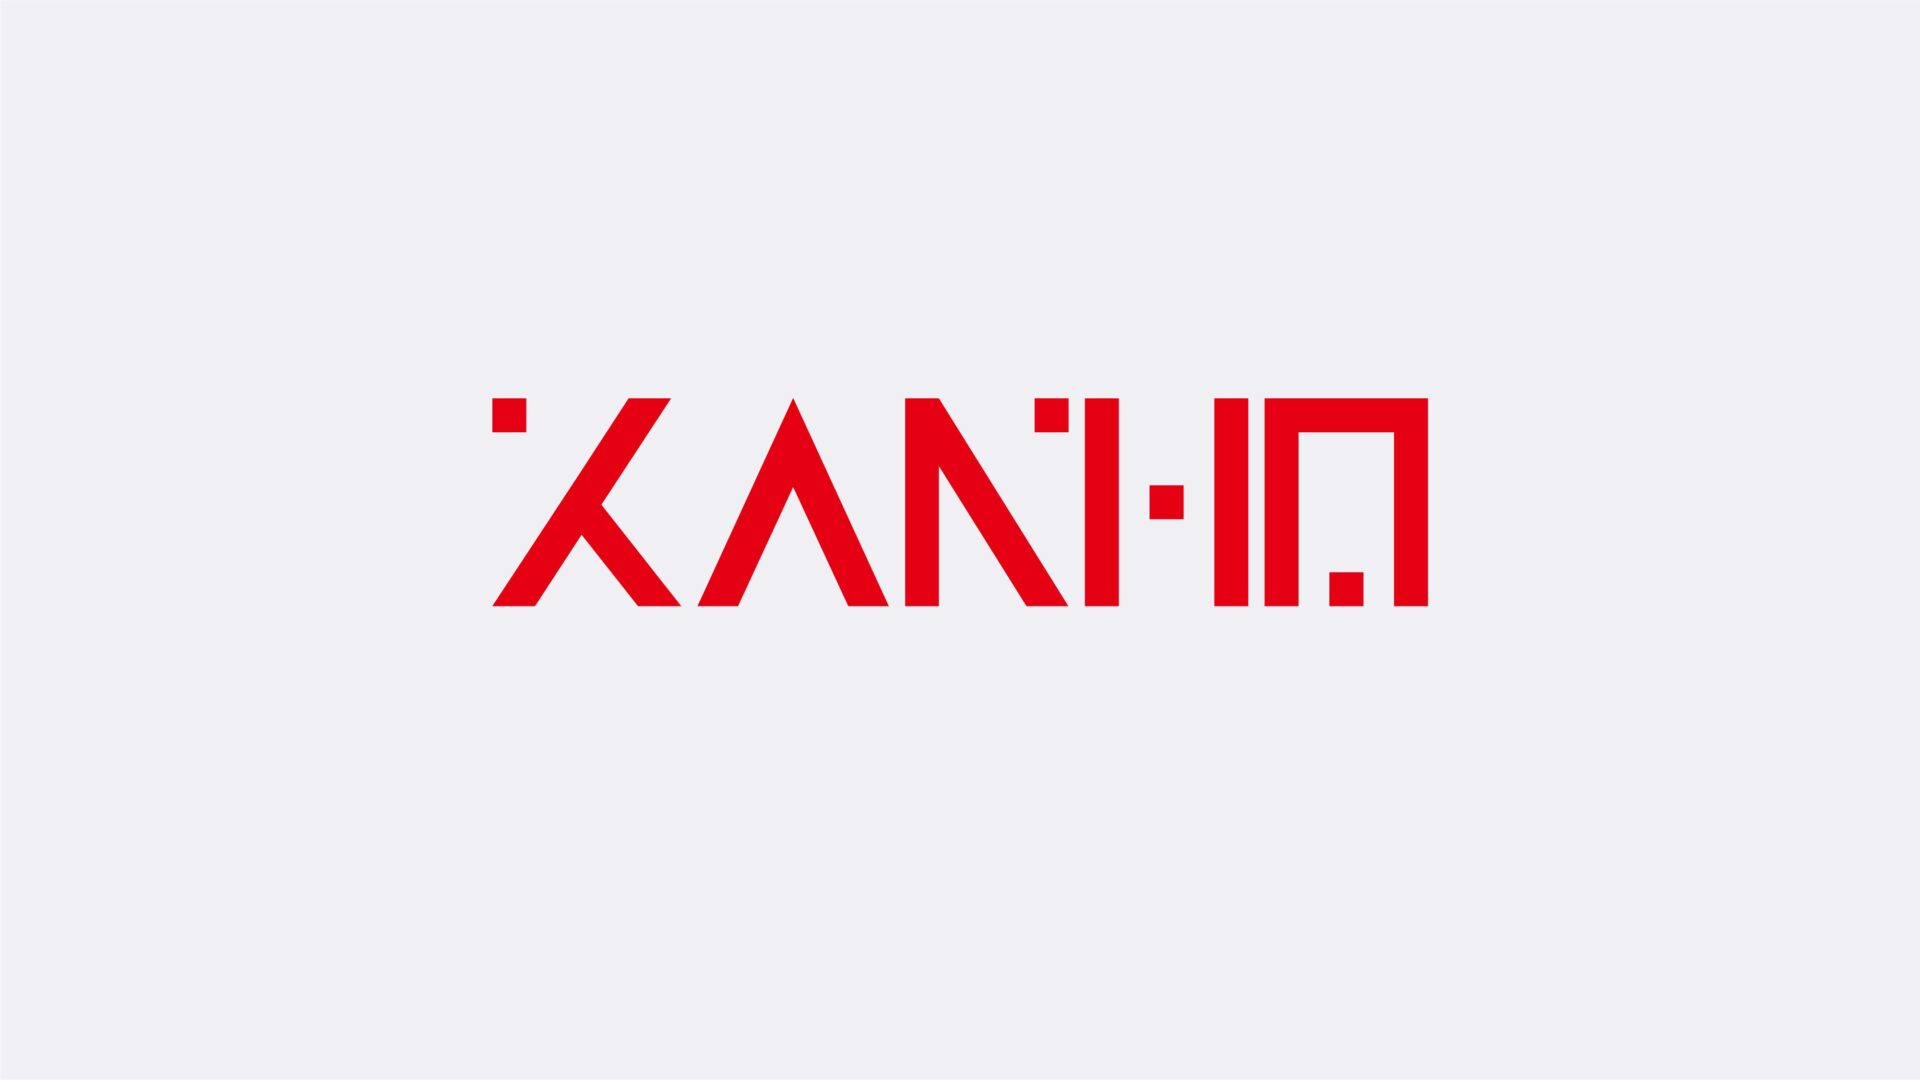 「KANHO」のサムネイル画像